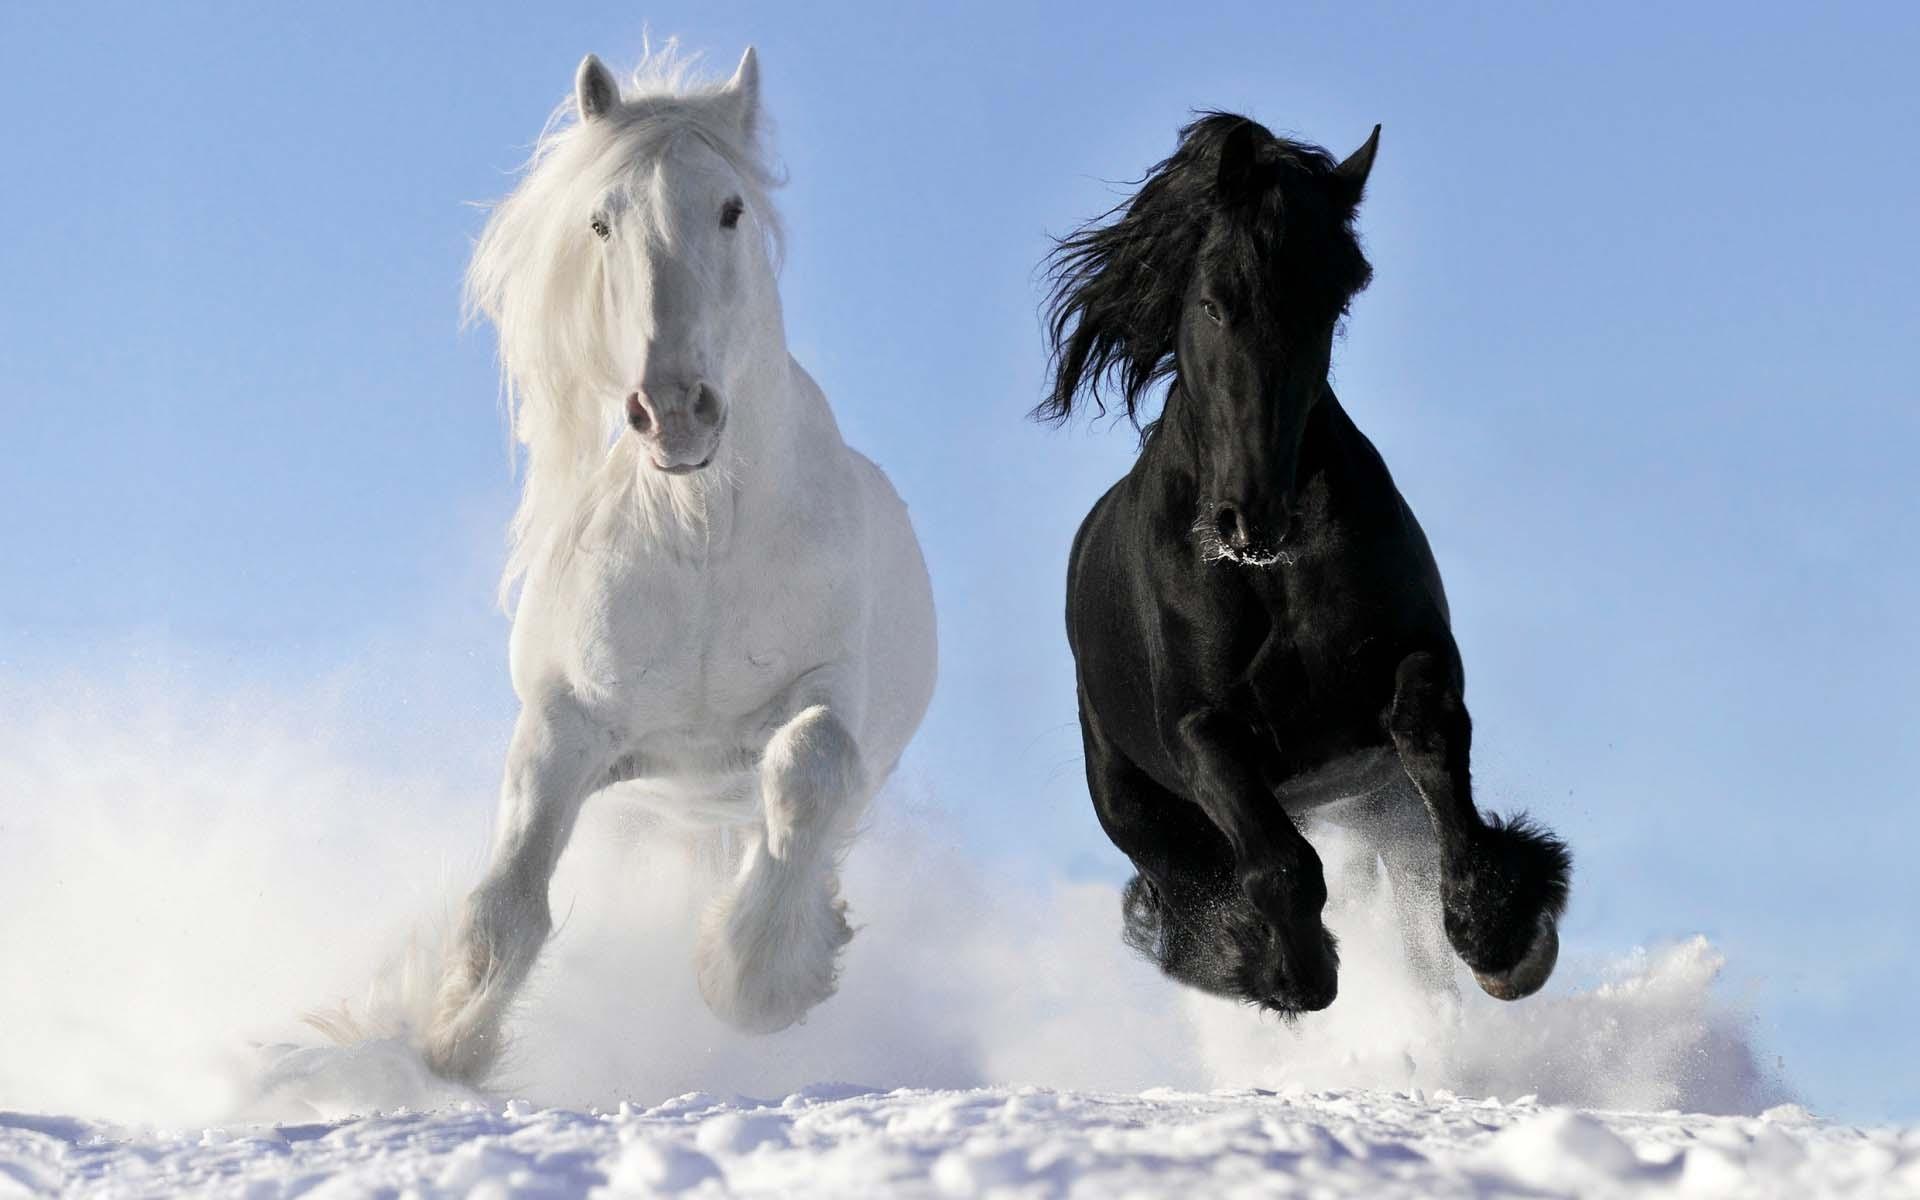 بالصور صور خيل , صور خيول جميلة 4344 1